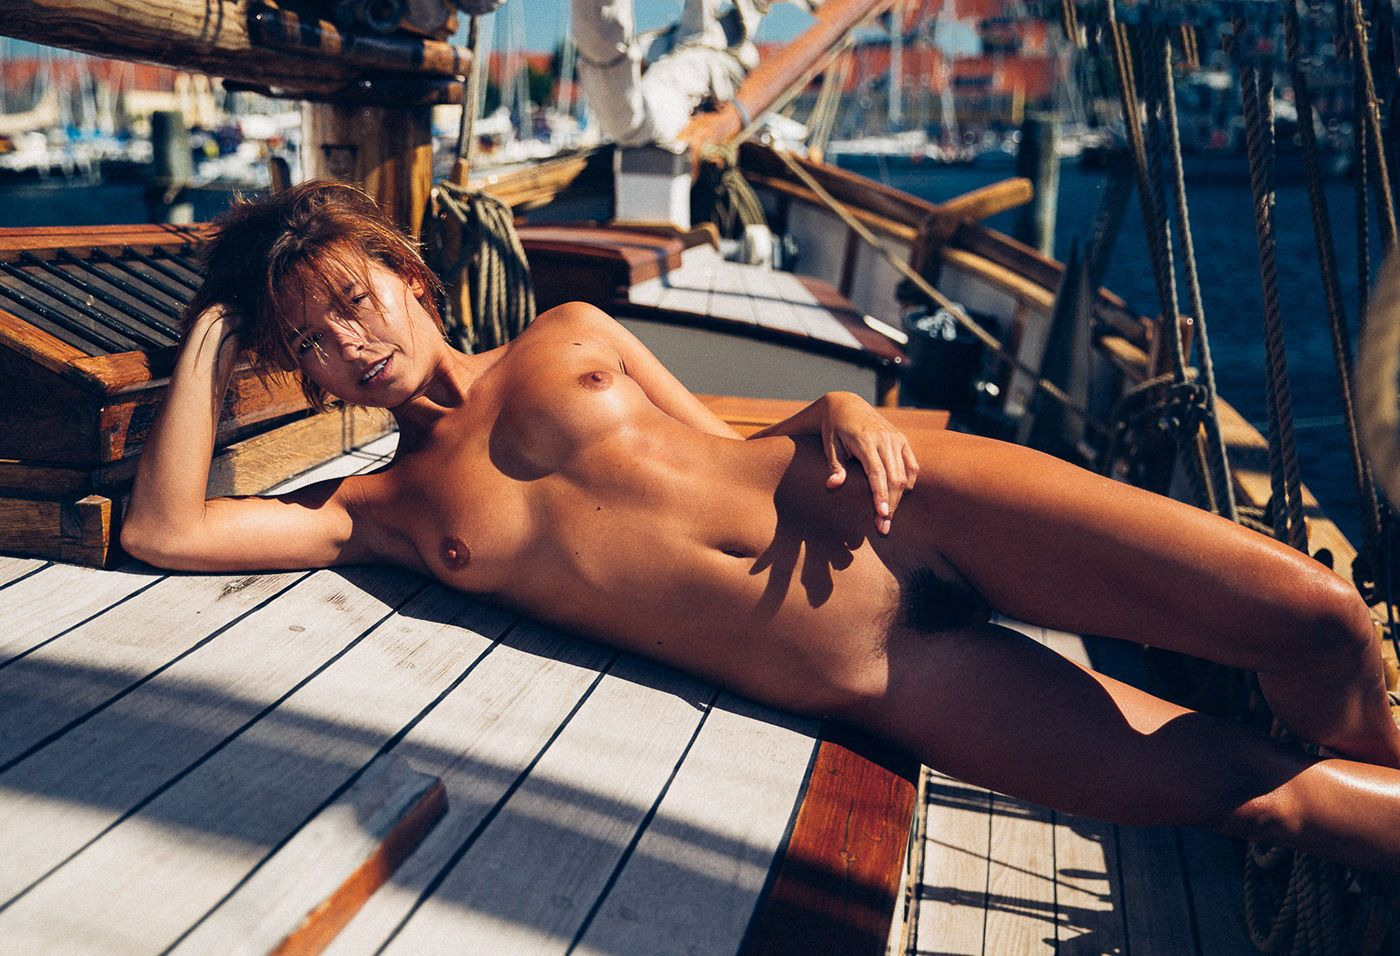 marisa-papen-fully-nude-36067-thefappeningblog.com_.jpg